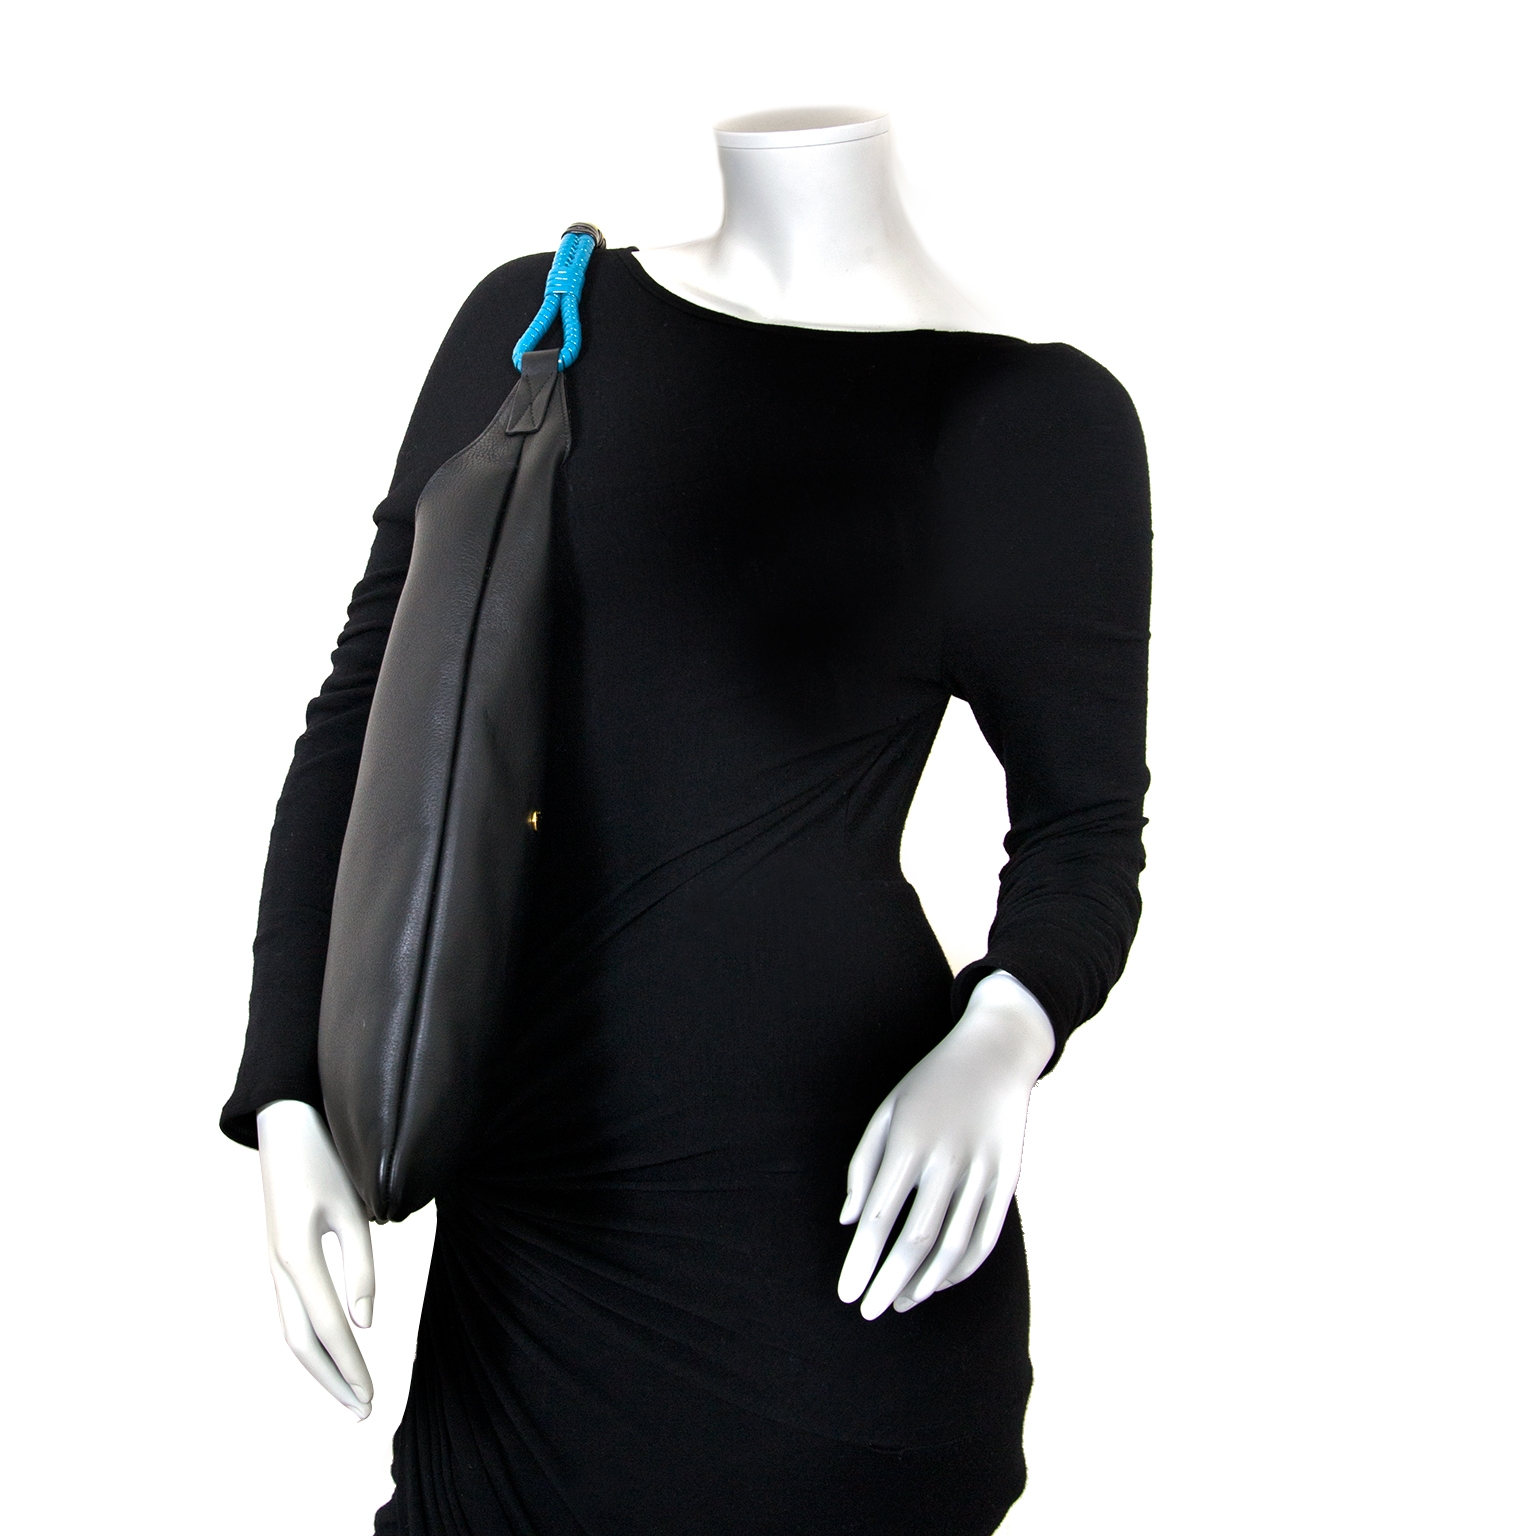 marni black leather tote bag now for sale at labellov vintage fashion webshop belgium